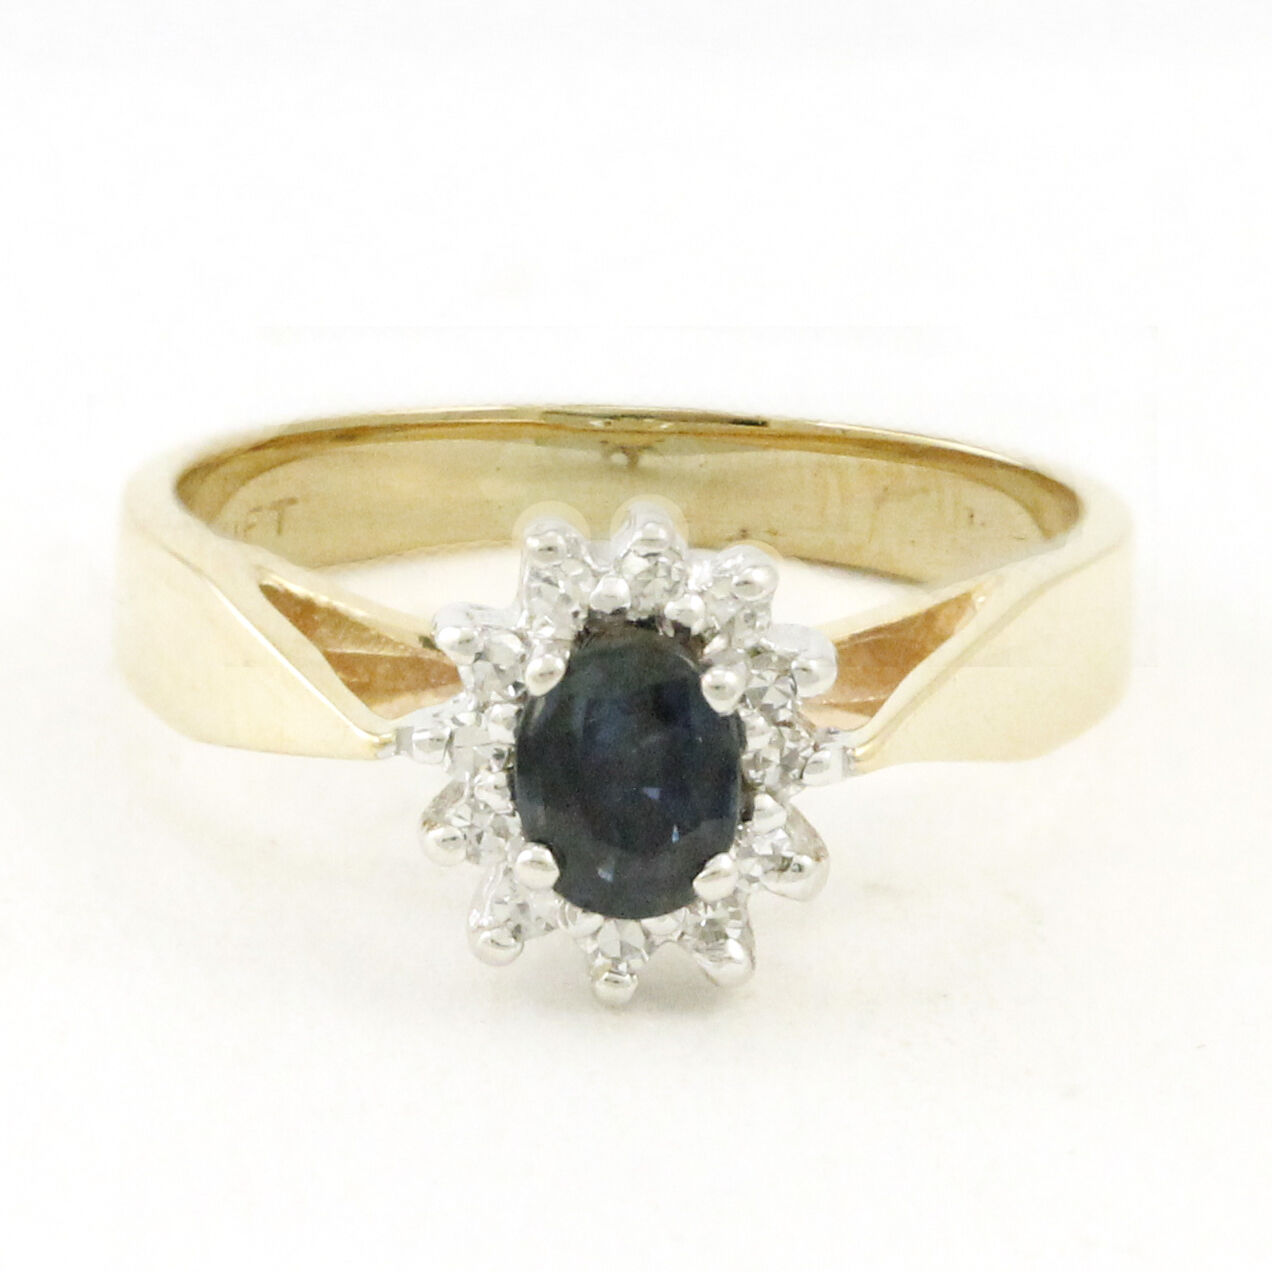 14k Yellow gold Sapphire Diamond Ring (estate, 0.12ct tdw, 1 stones) 3802